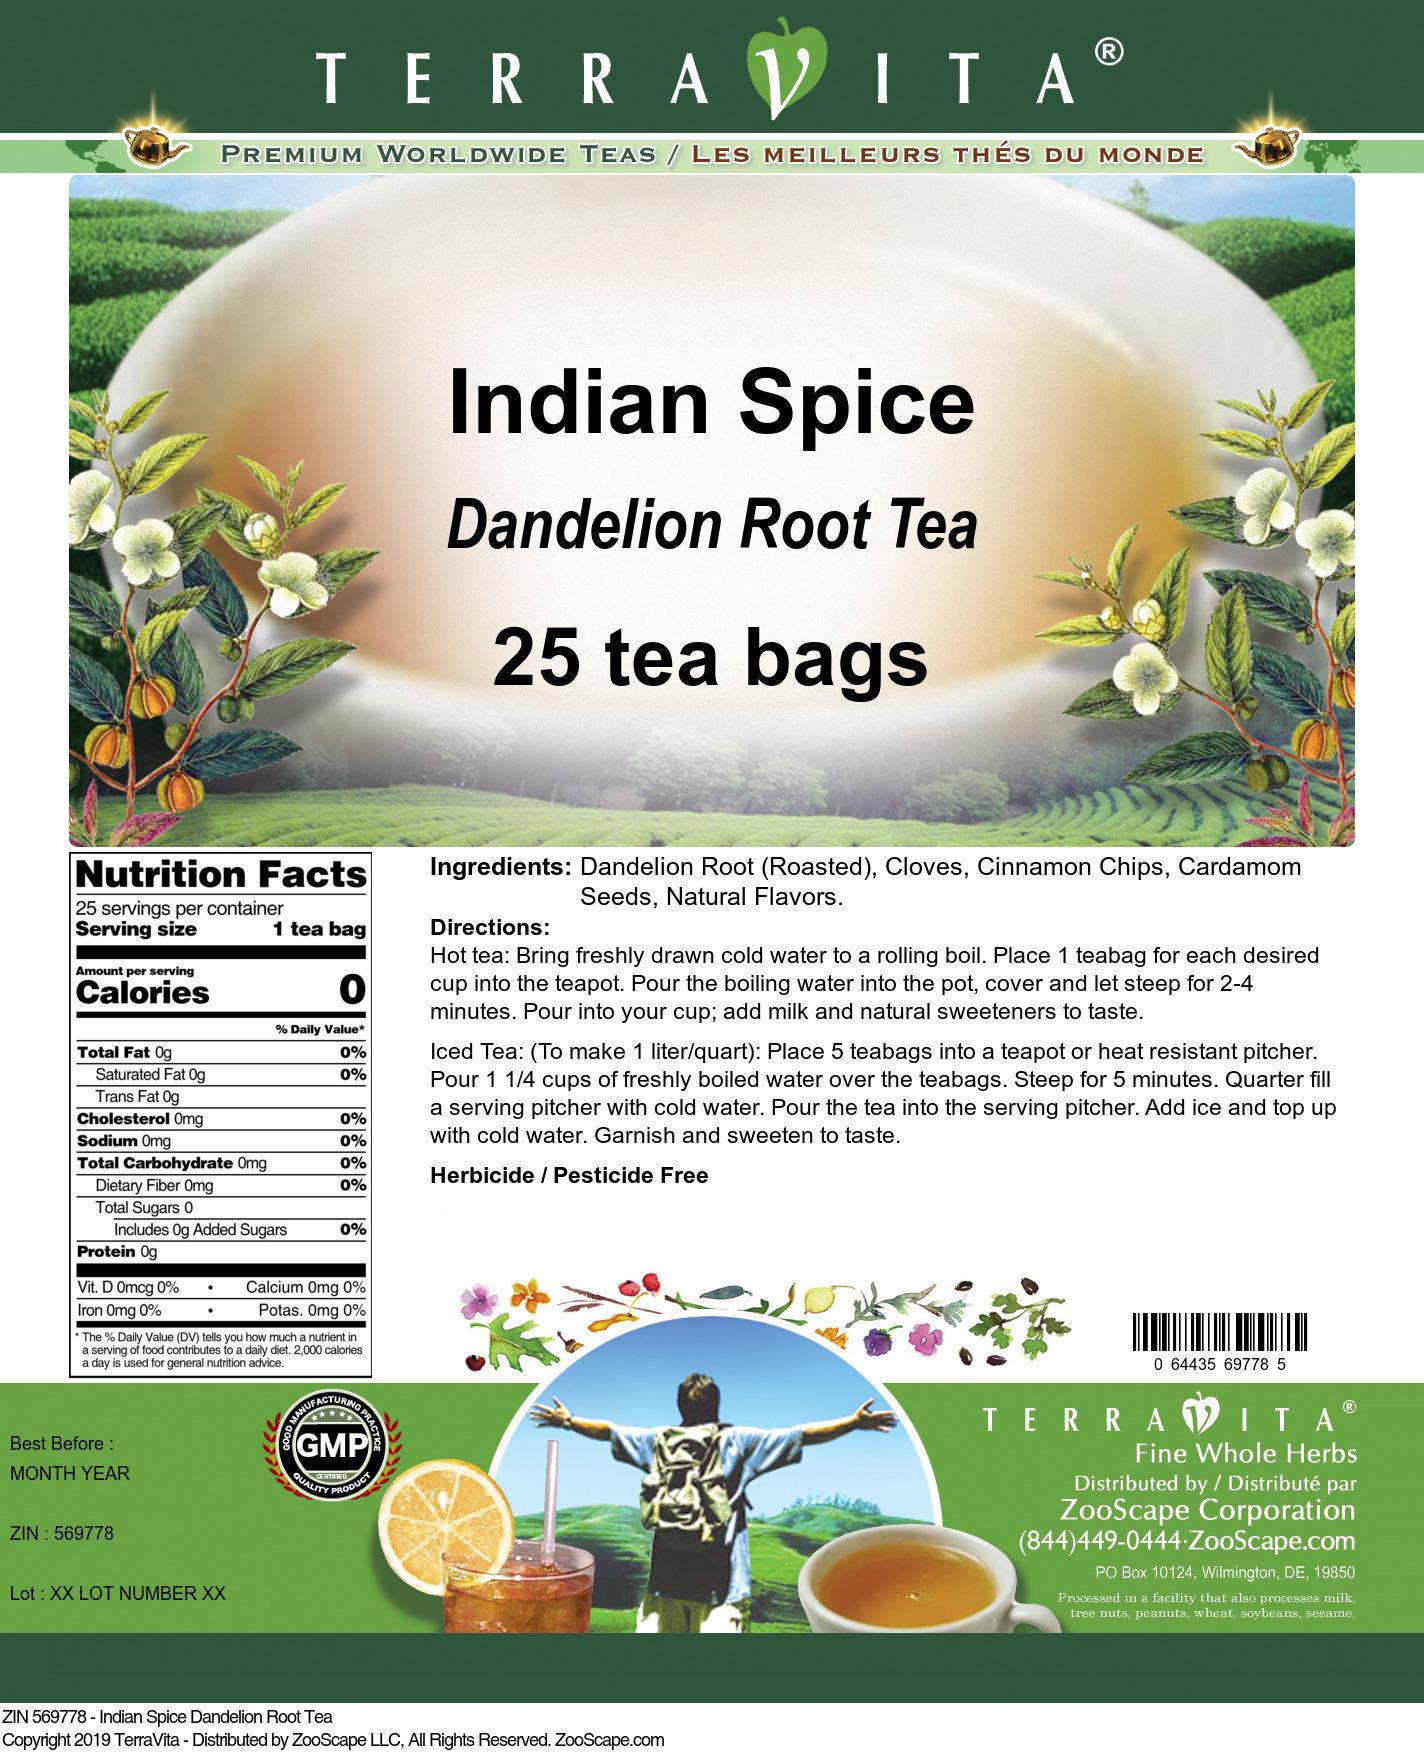 Indian Spice Dandelion Root